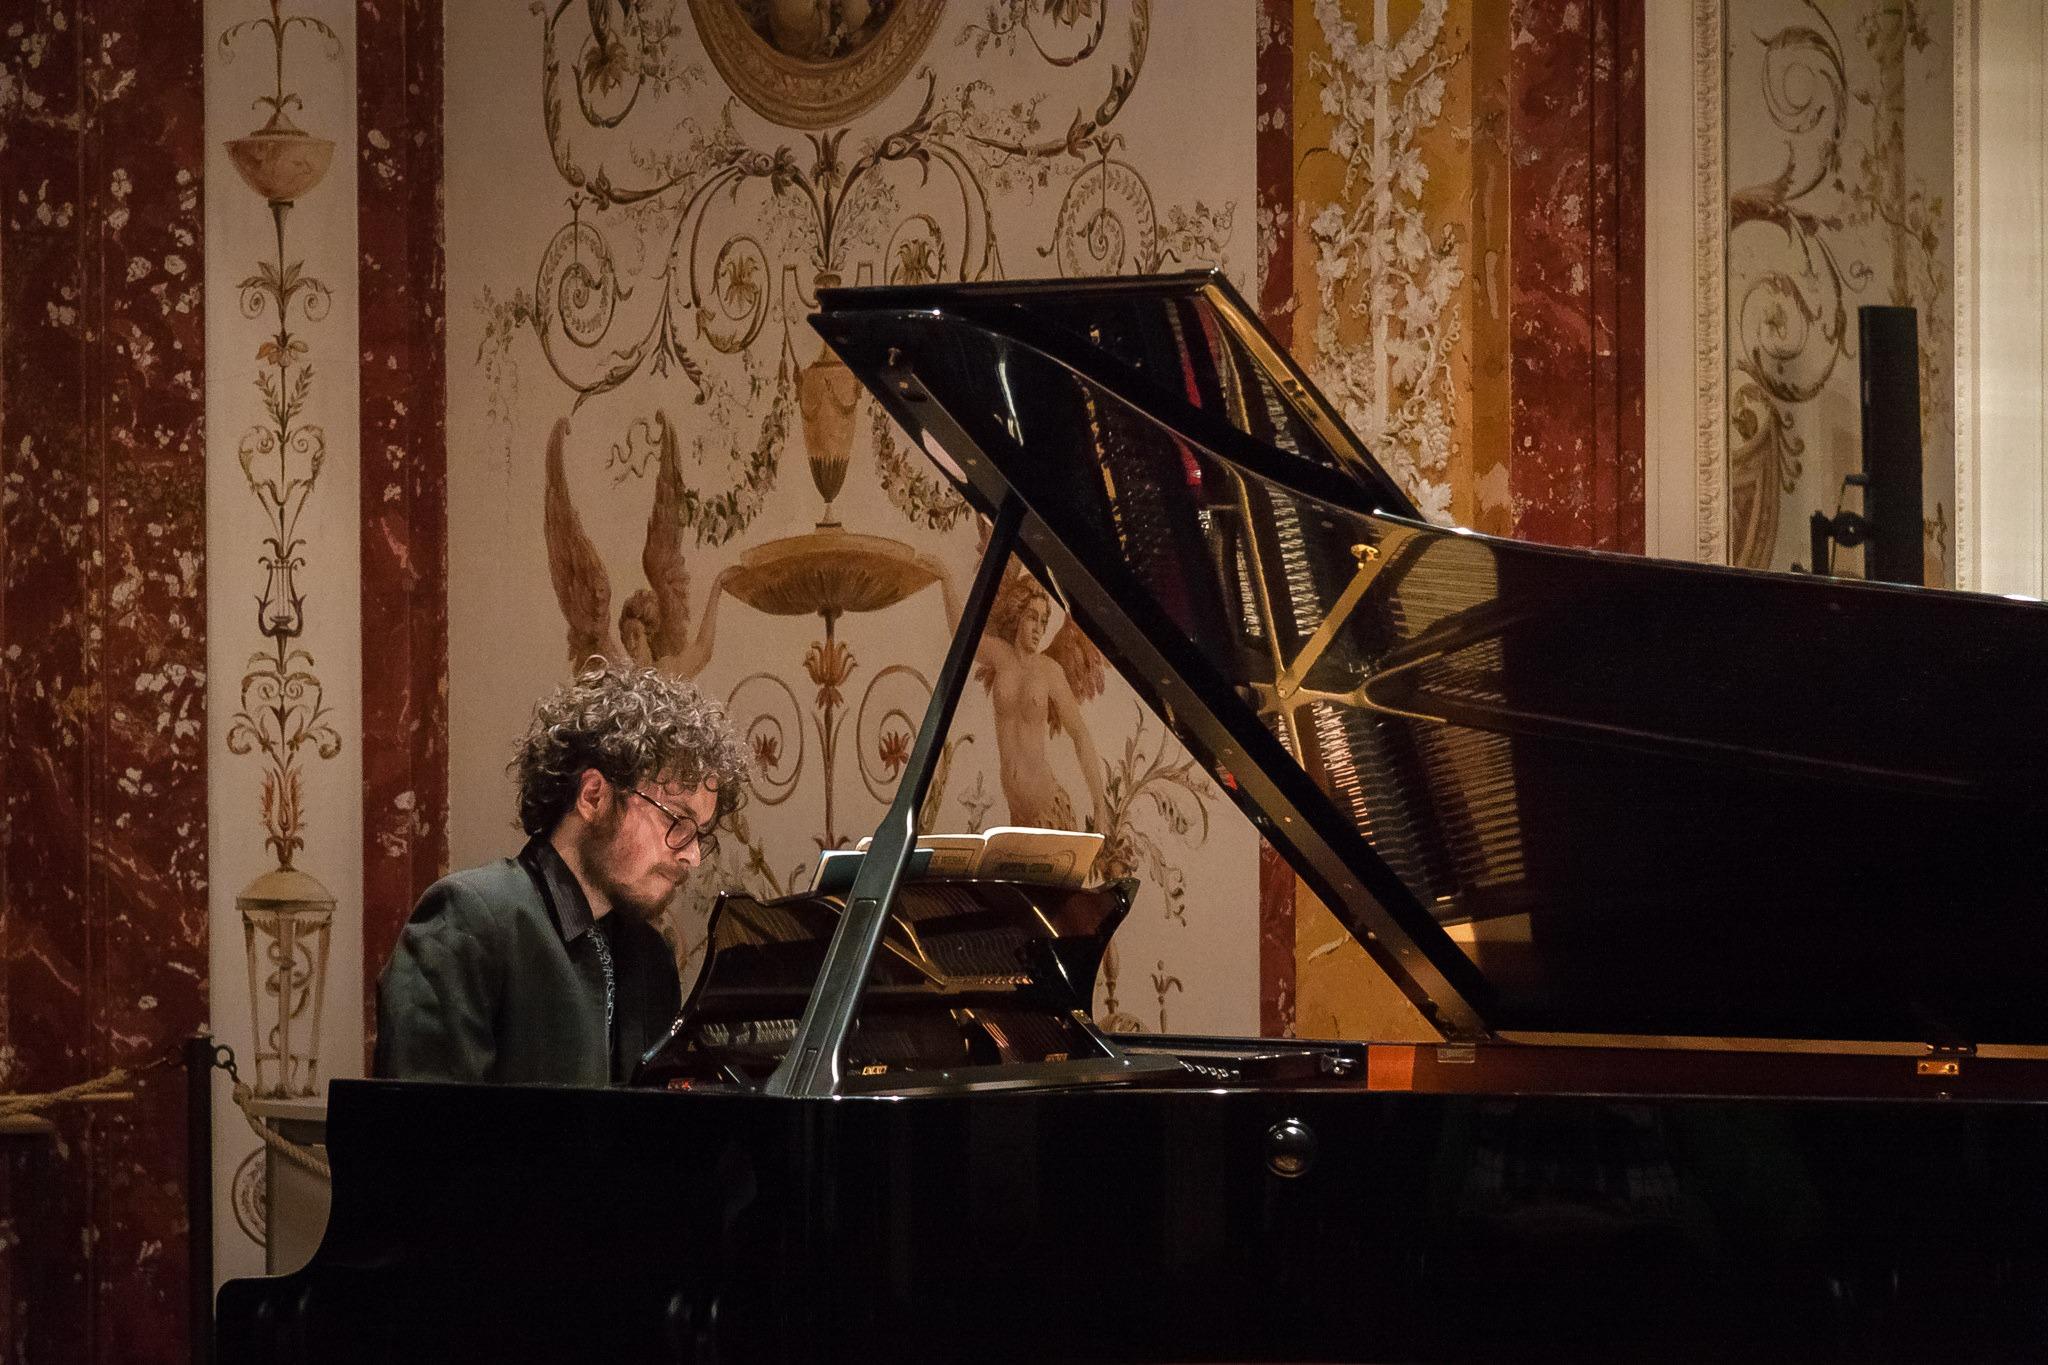 Joshua Rupley Piano Recital Klang Kartei Toskanasaal